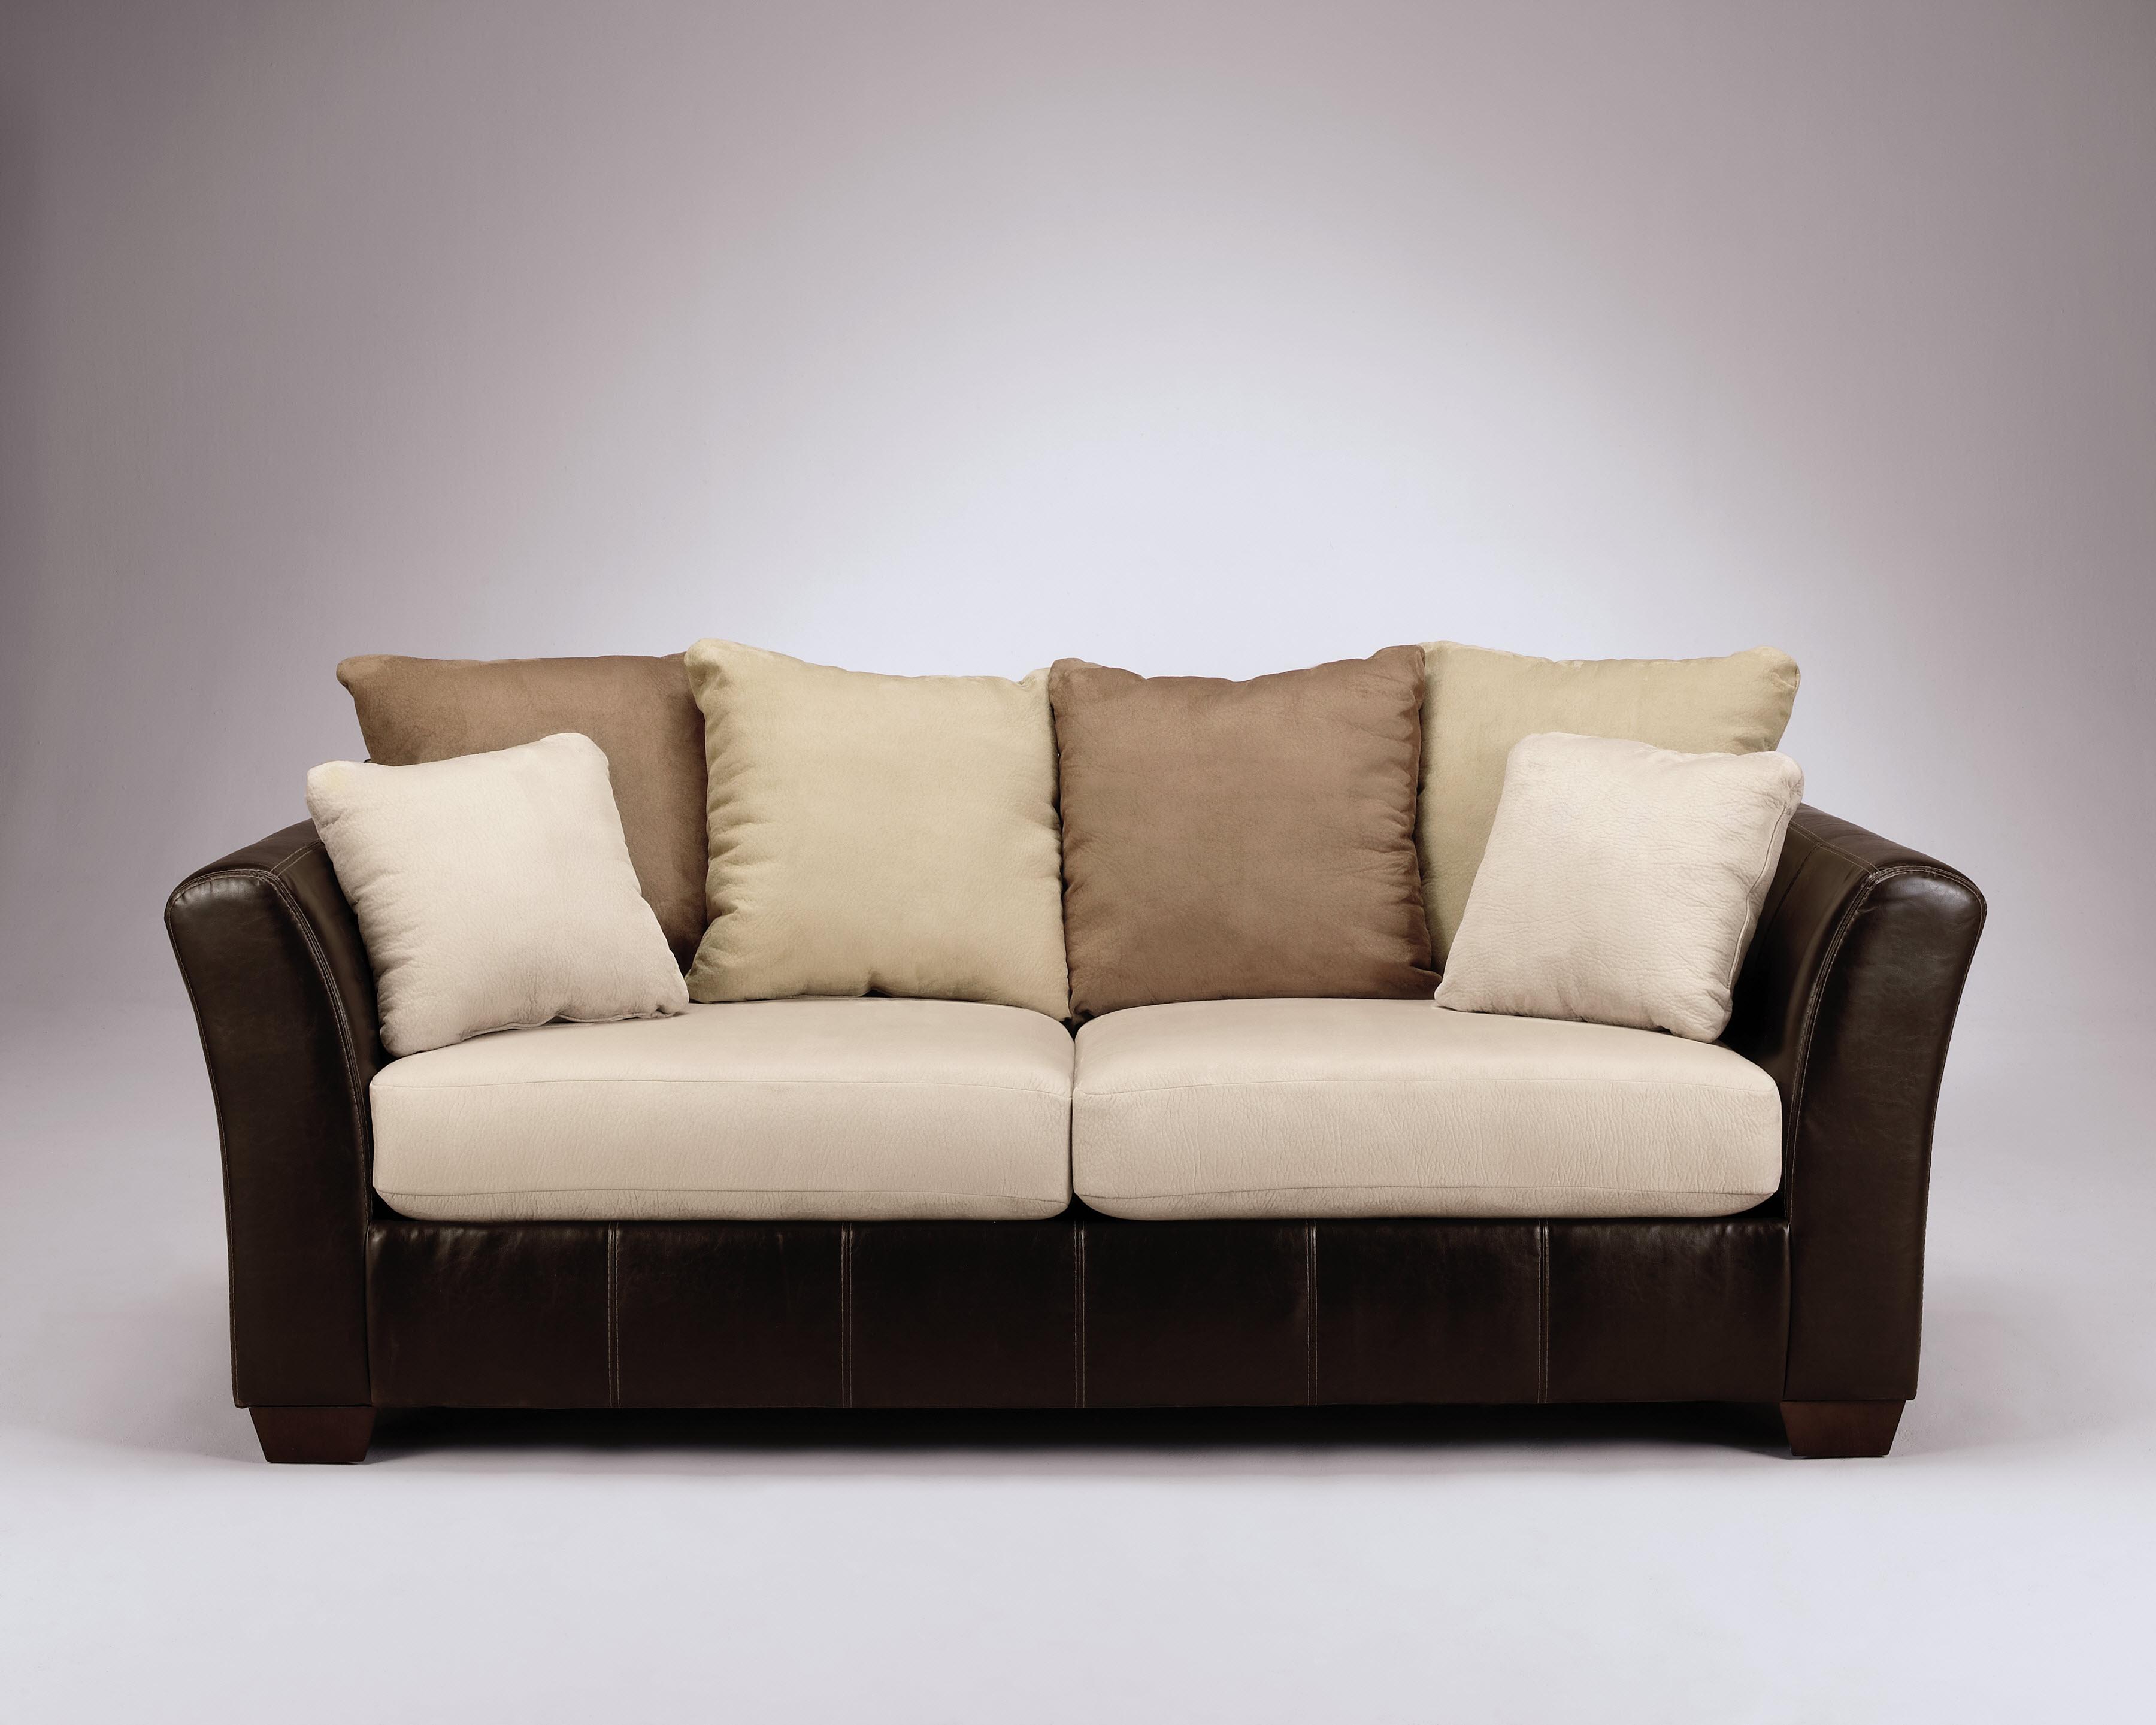 Ashley Furniture HomeStore Announces Launch of Biannual Big Event Sale